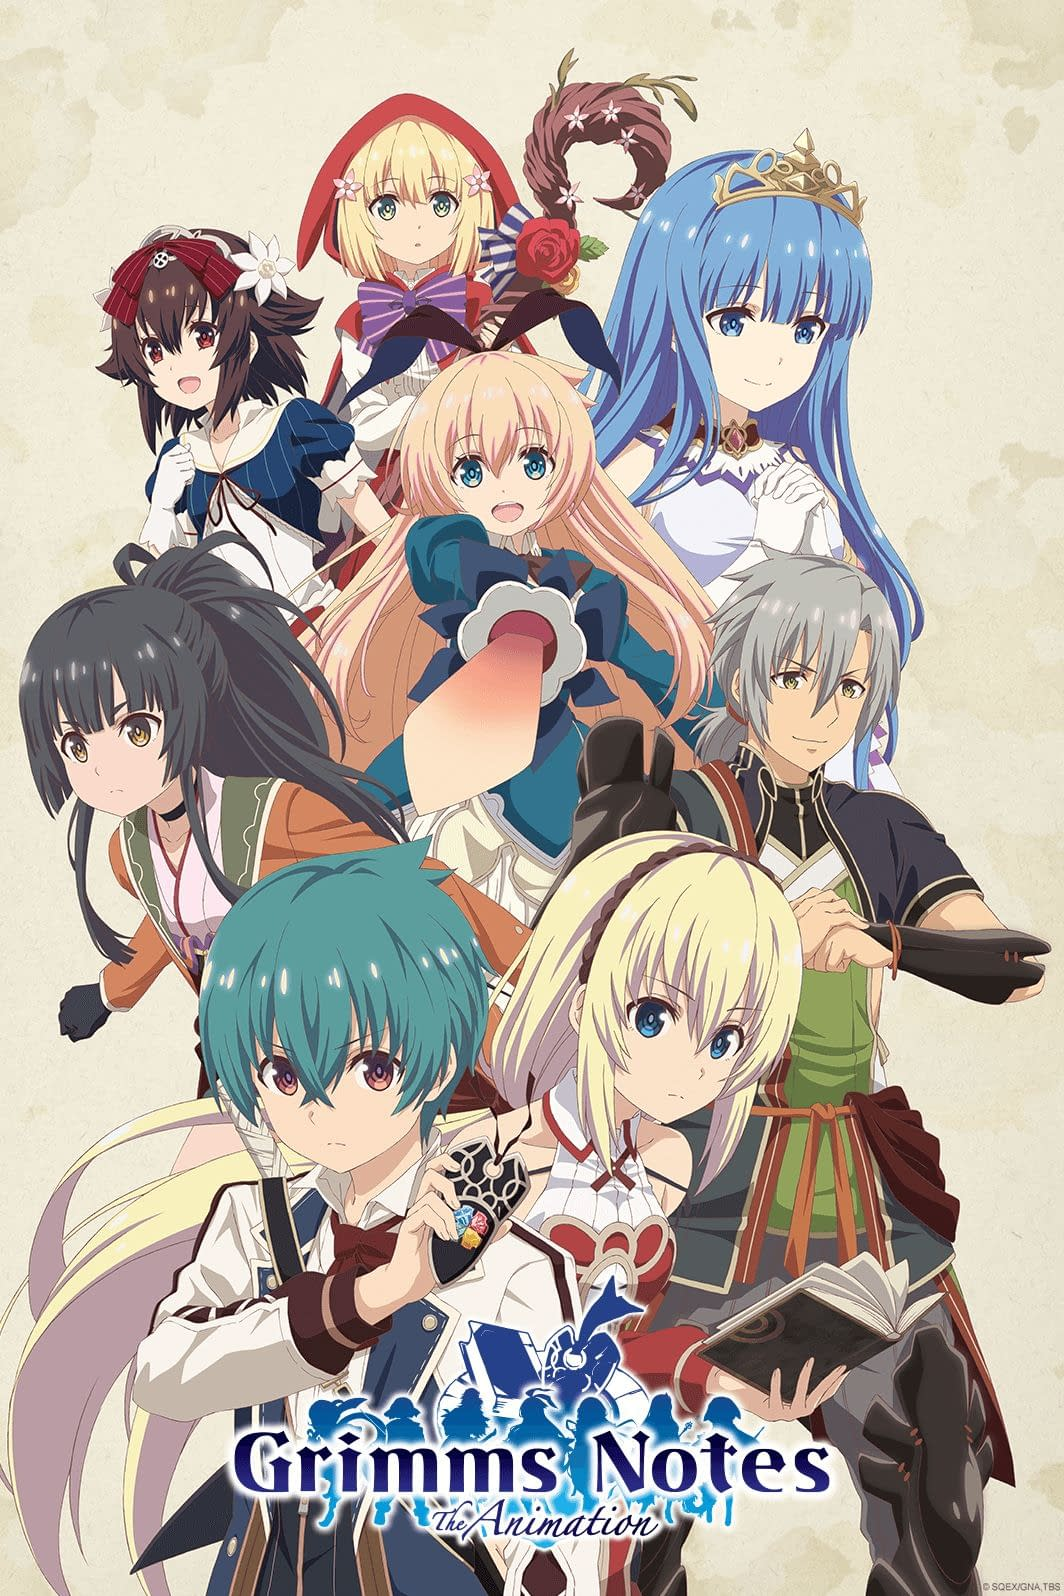 Crunchyroll Winter 2019: Final Slate of Anime Shows Announced